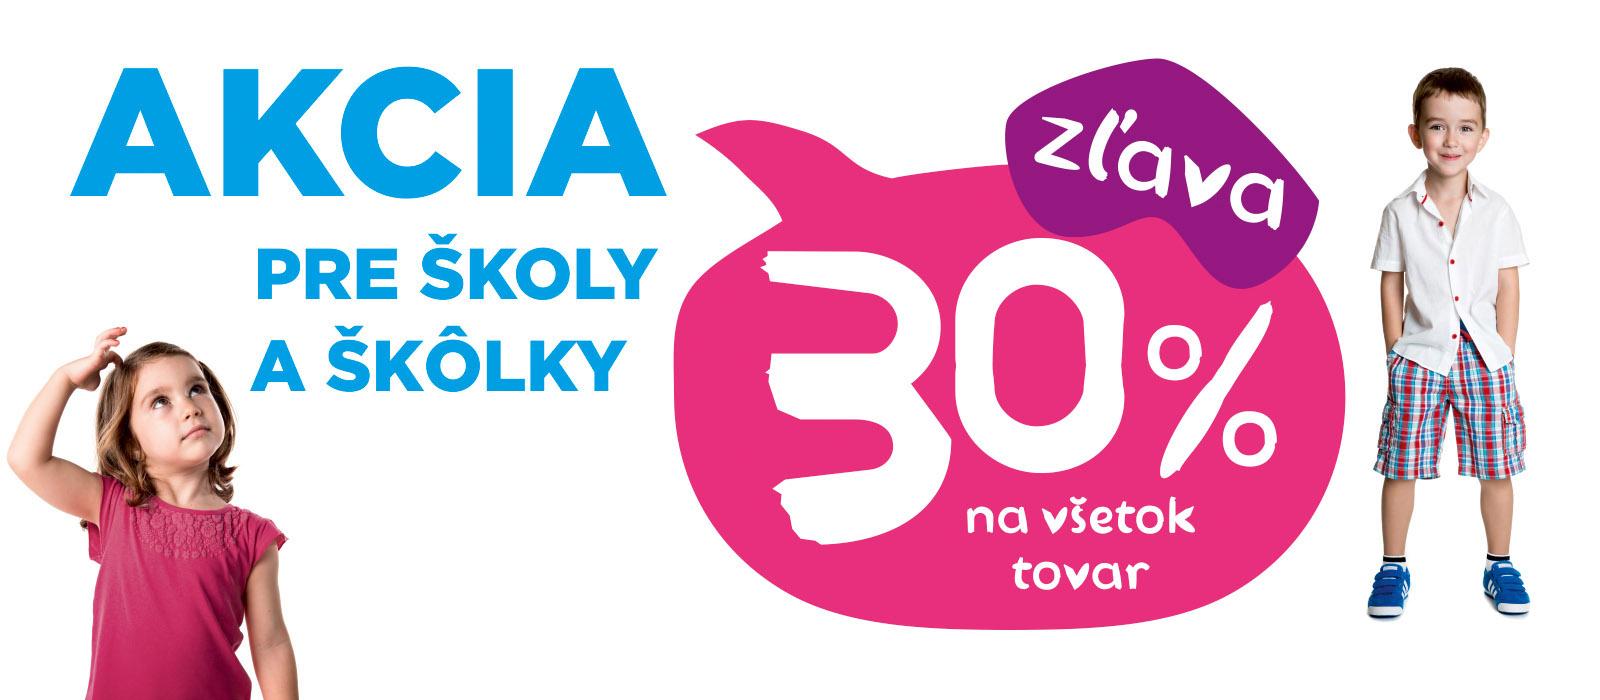 baner_web_1600x700_skola_SK_bez loga